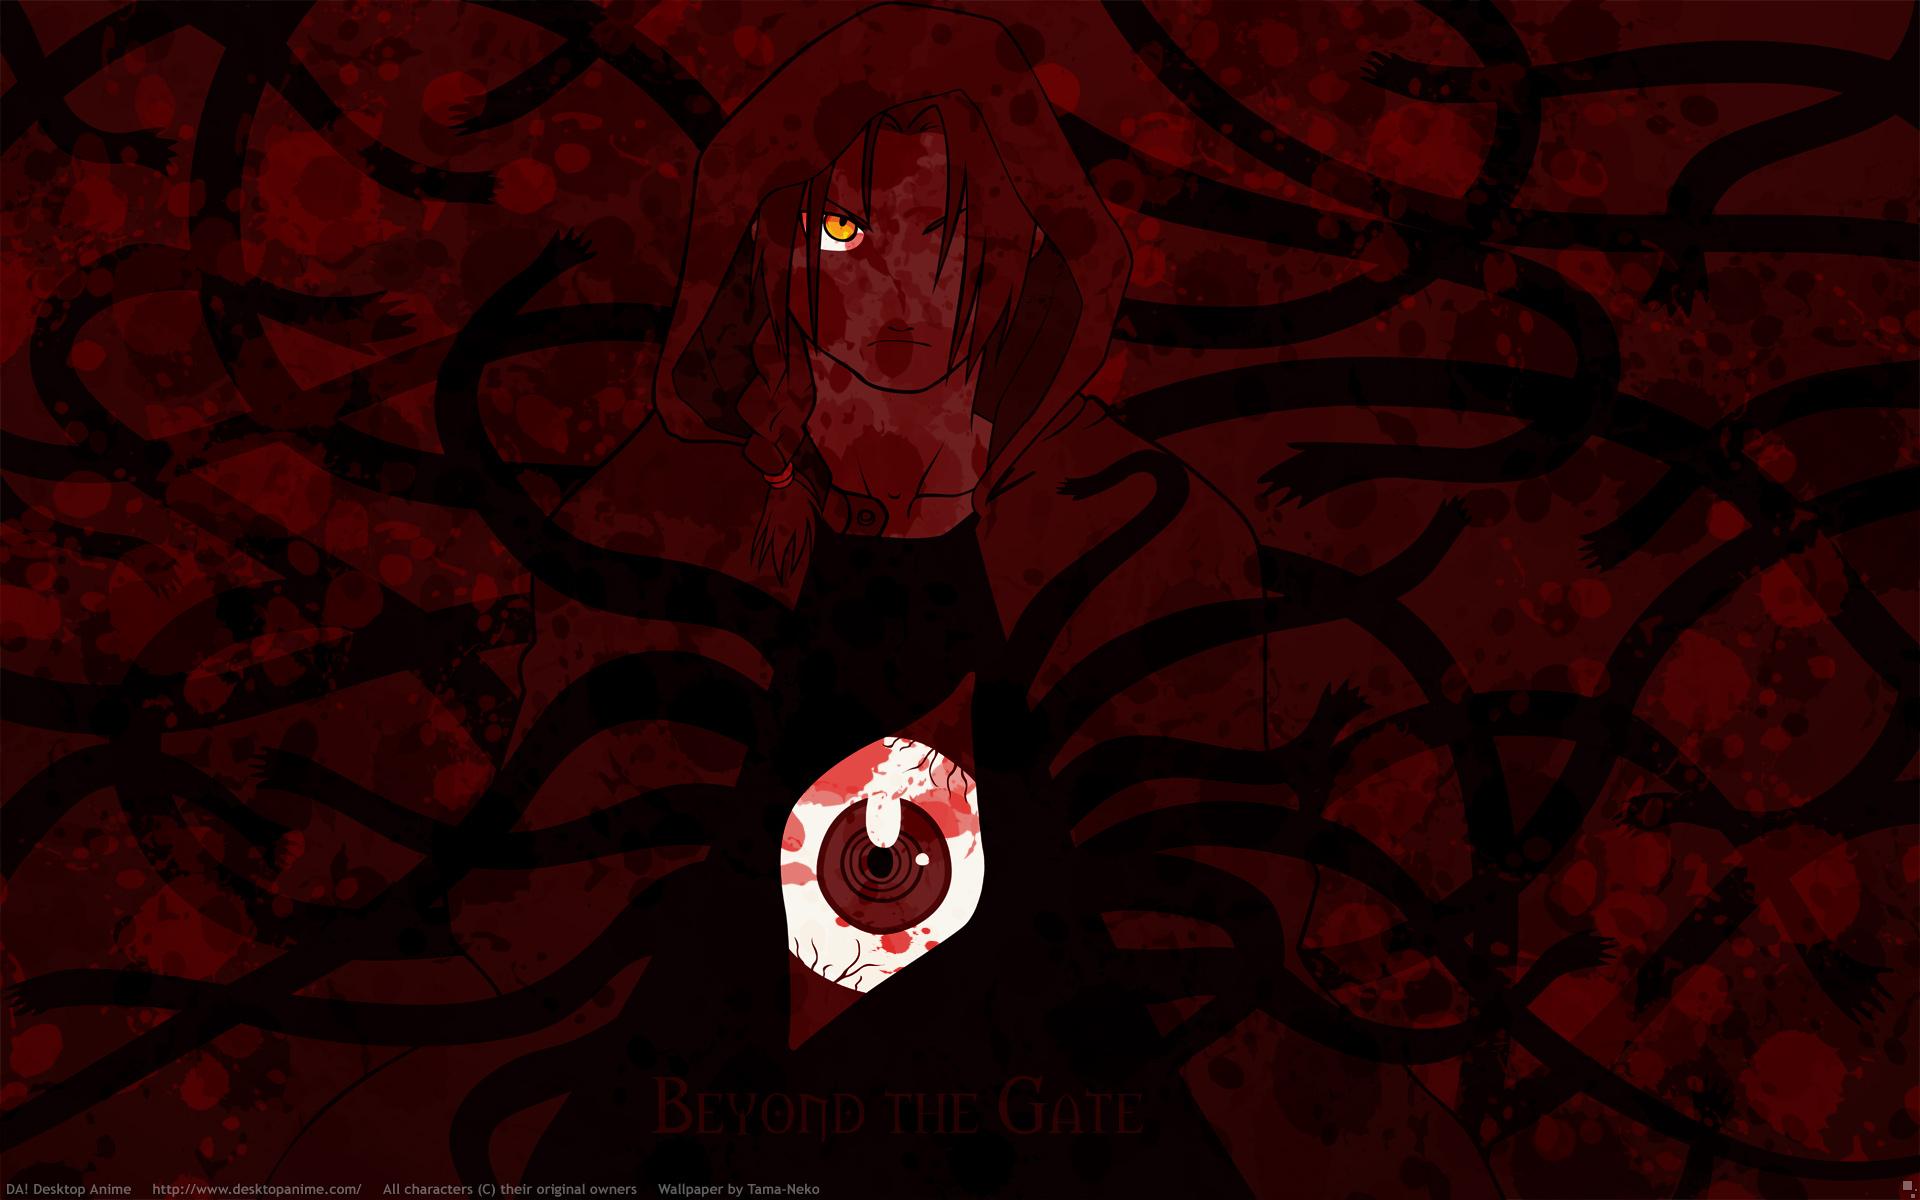 manga fullmetal alchemist wallpapers - photo #26